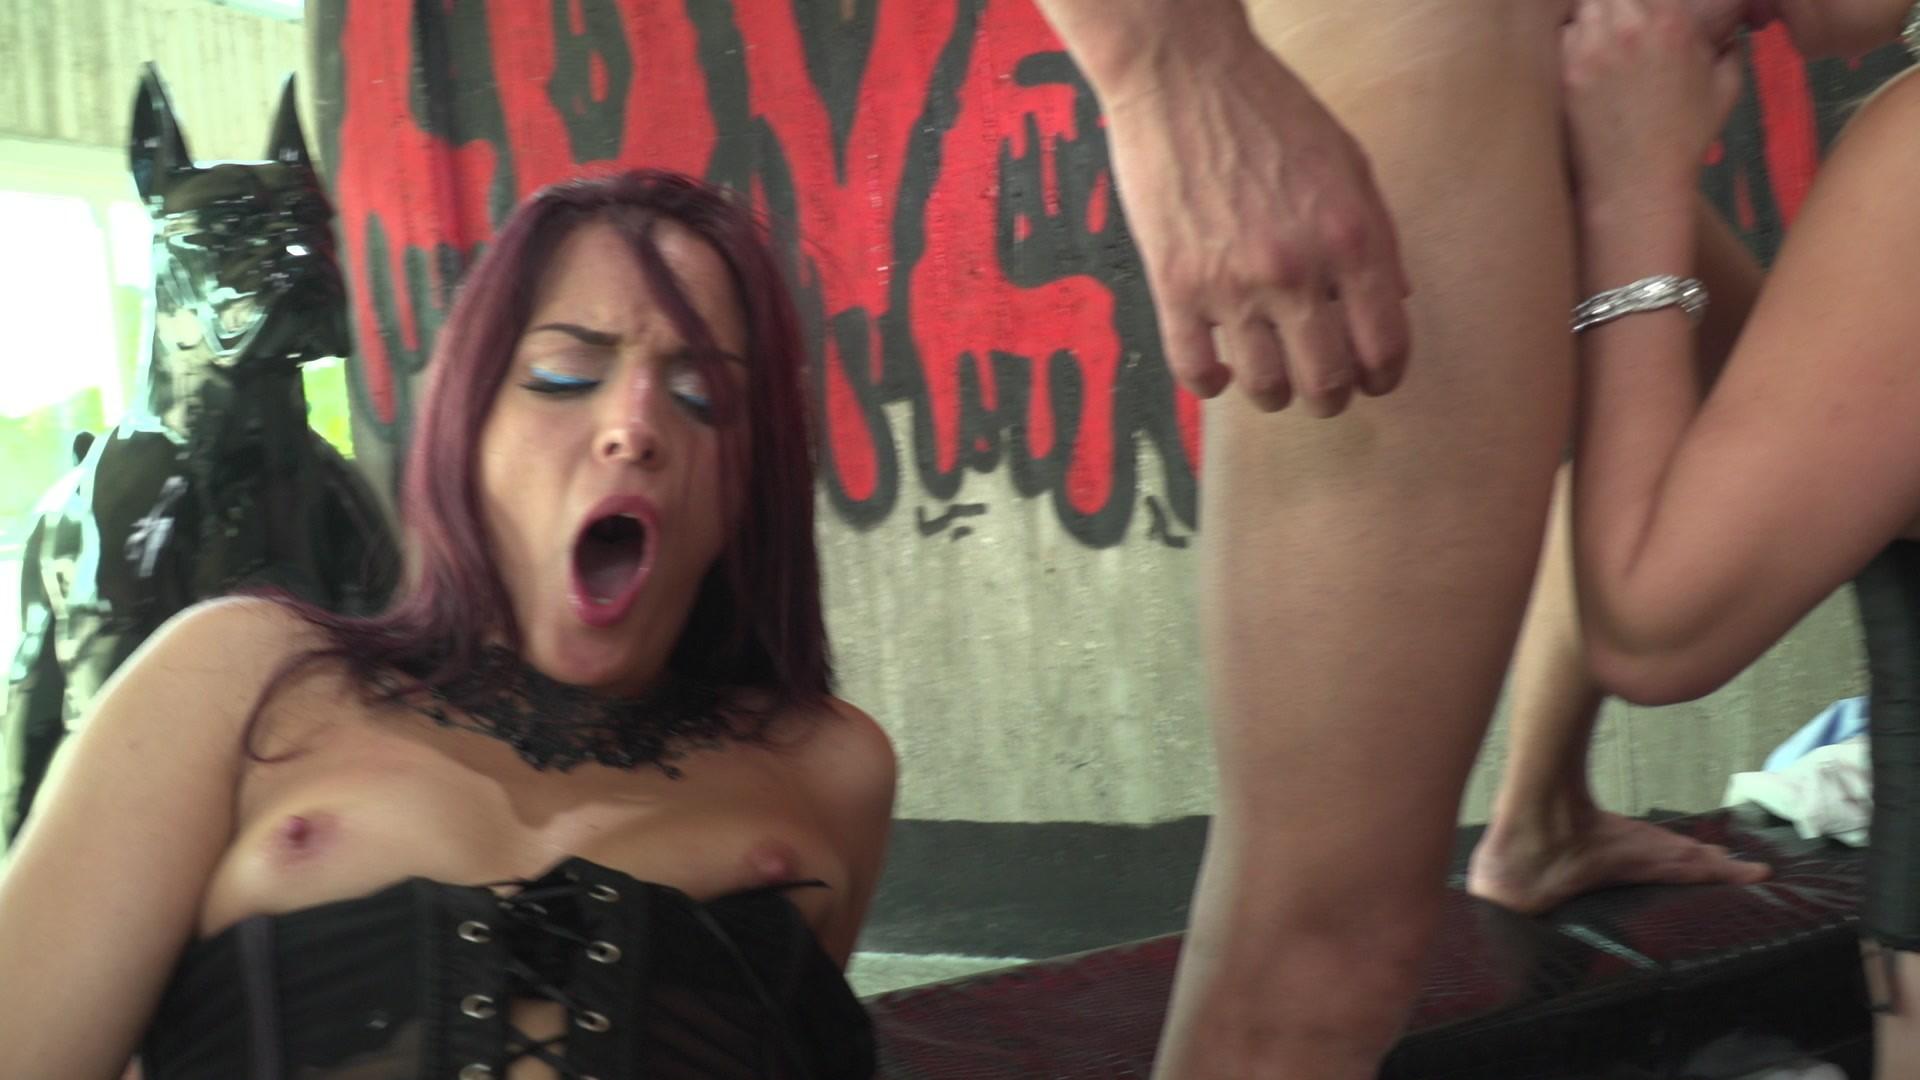 Lyen parker enjoys big dick anal sex 6